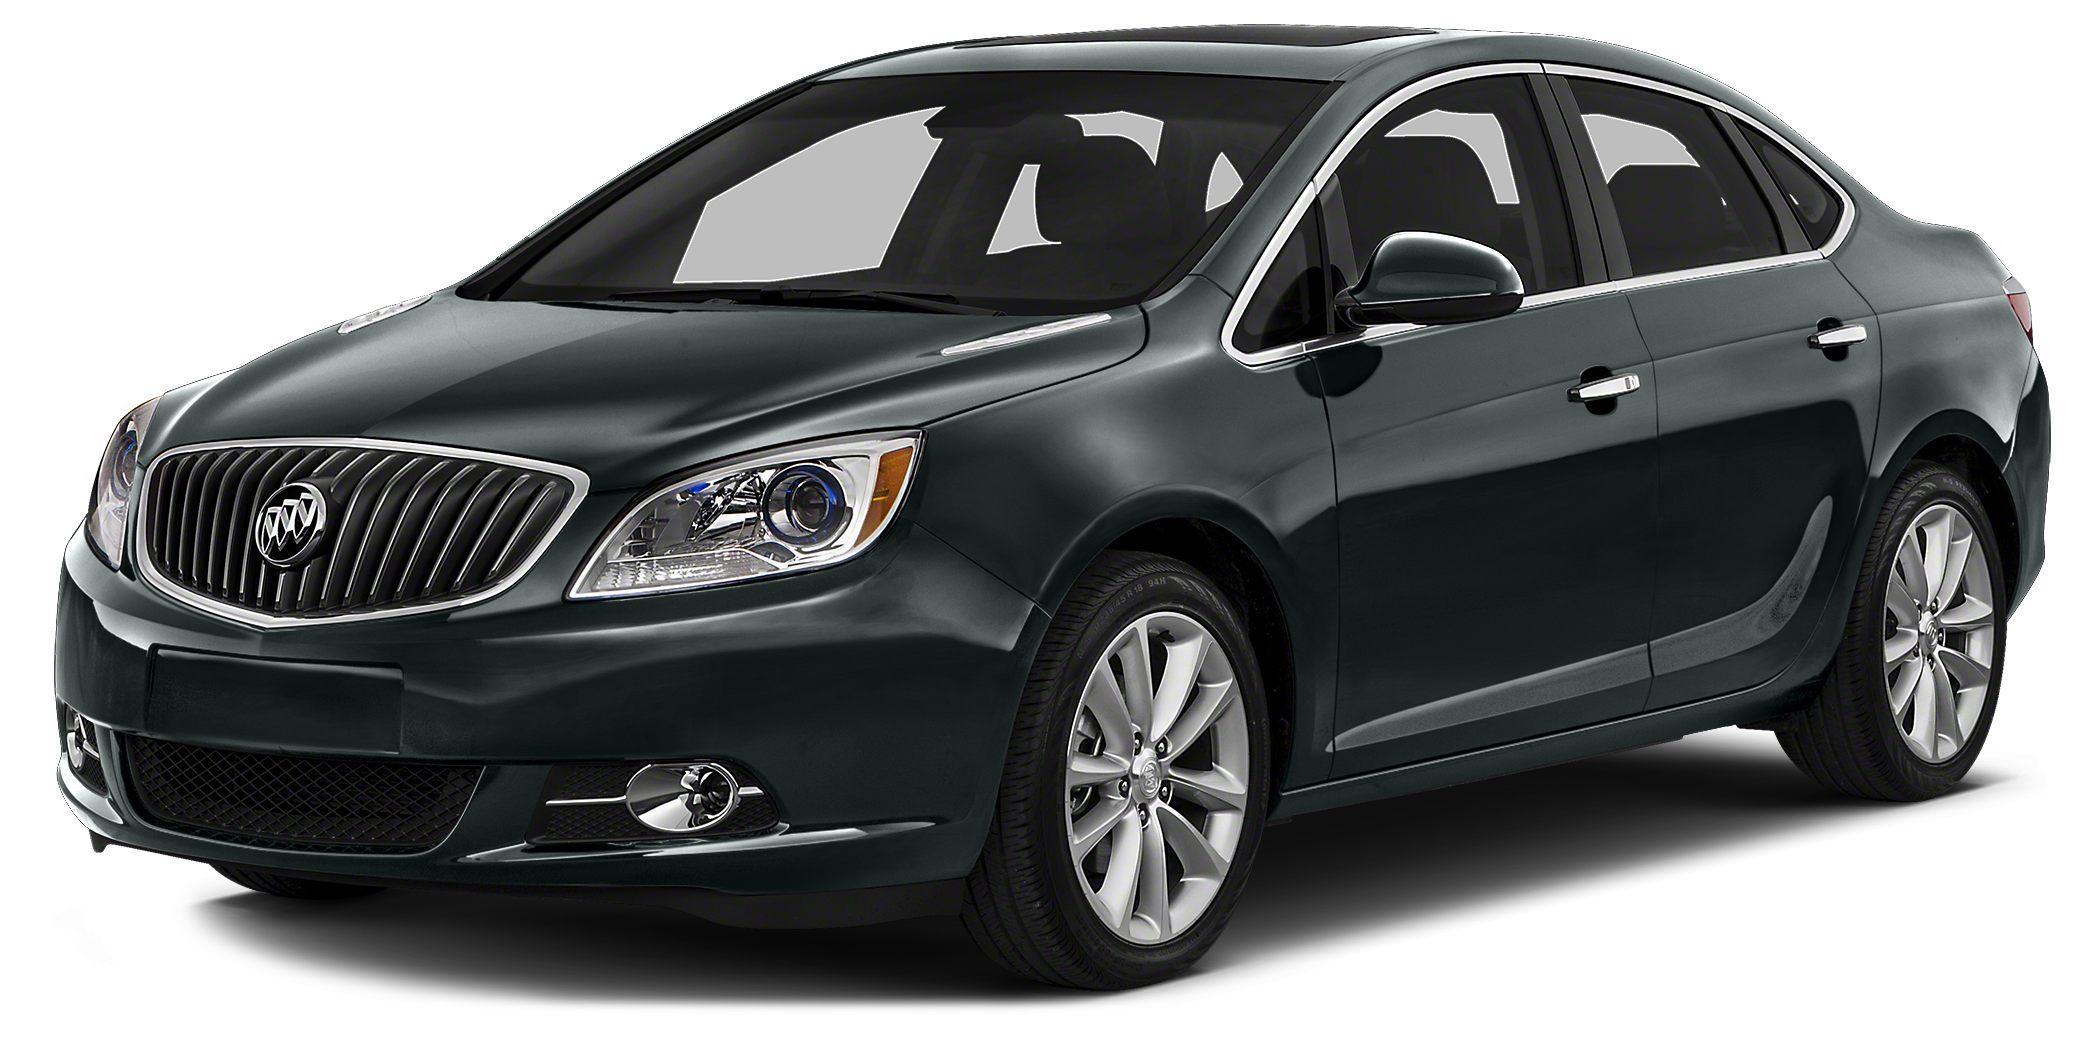 2016 Buick Verano Convenience Group Miles 5Color Gray Stock 109272 VIN 1G4PR5SK8G4109272